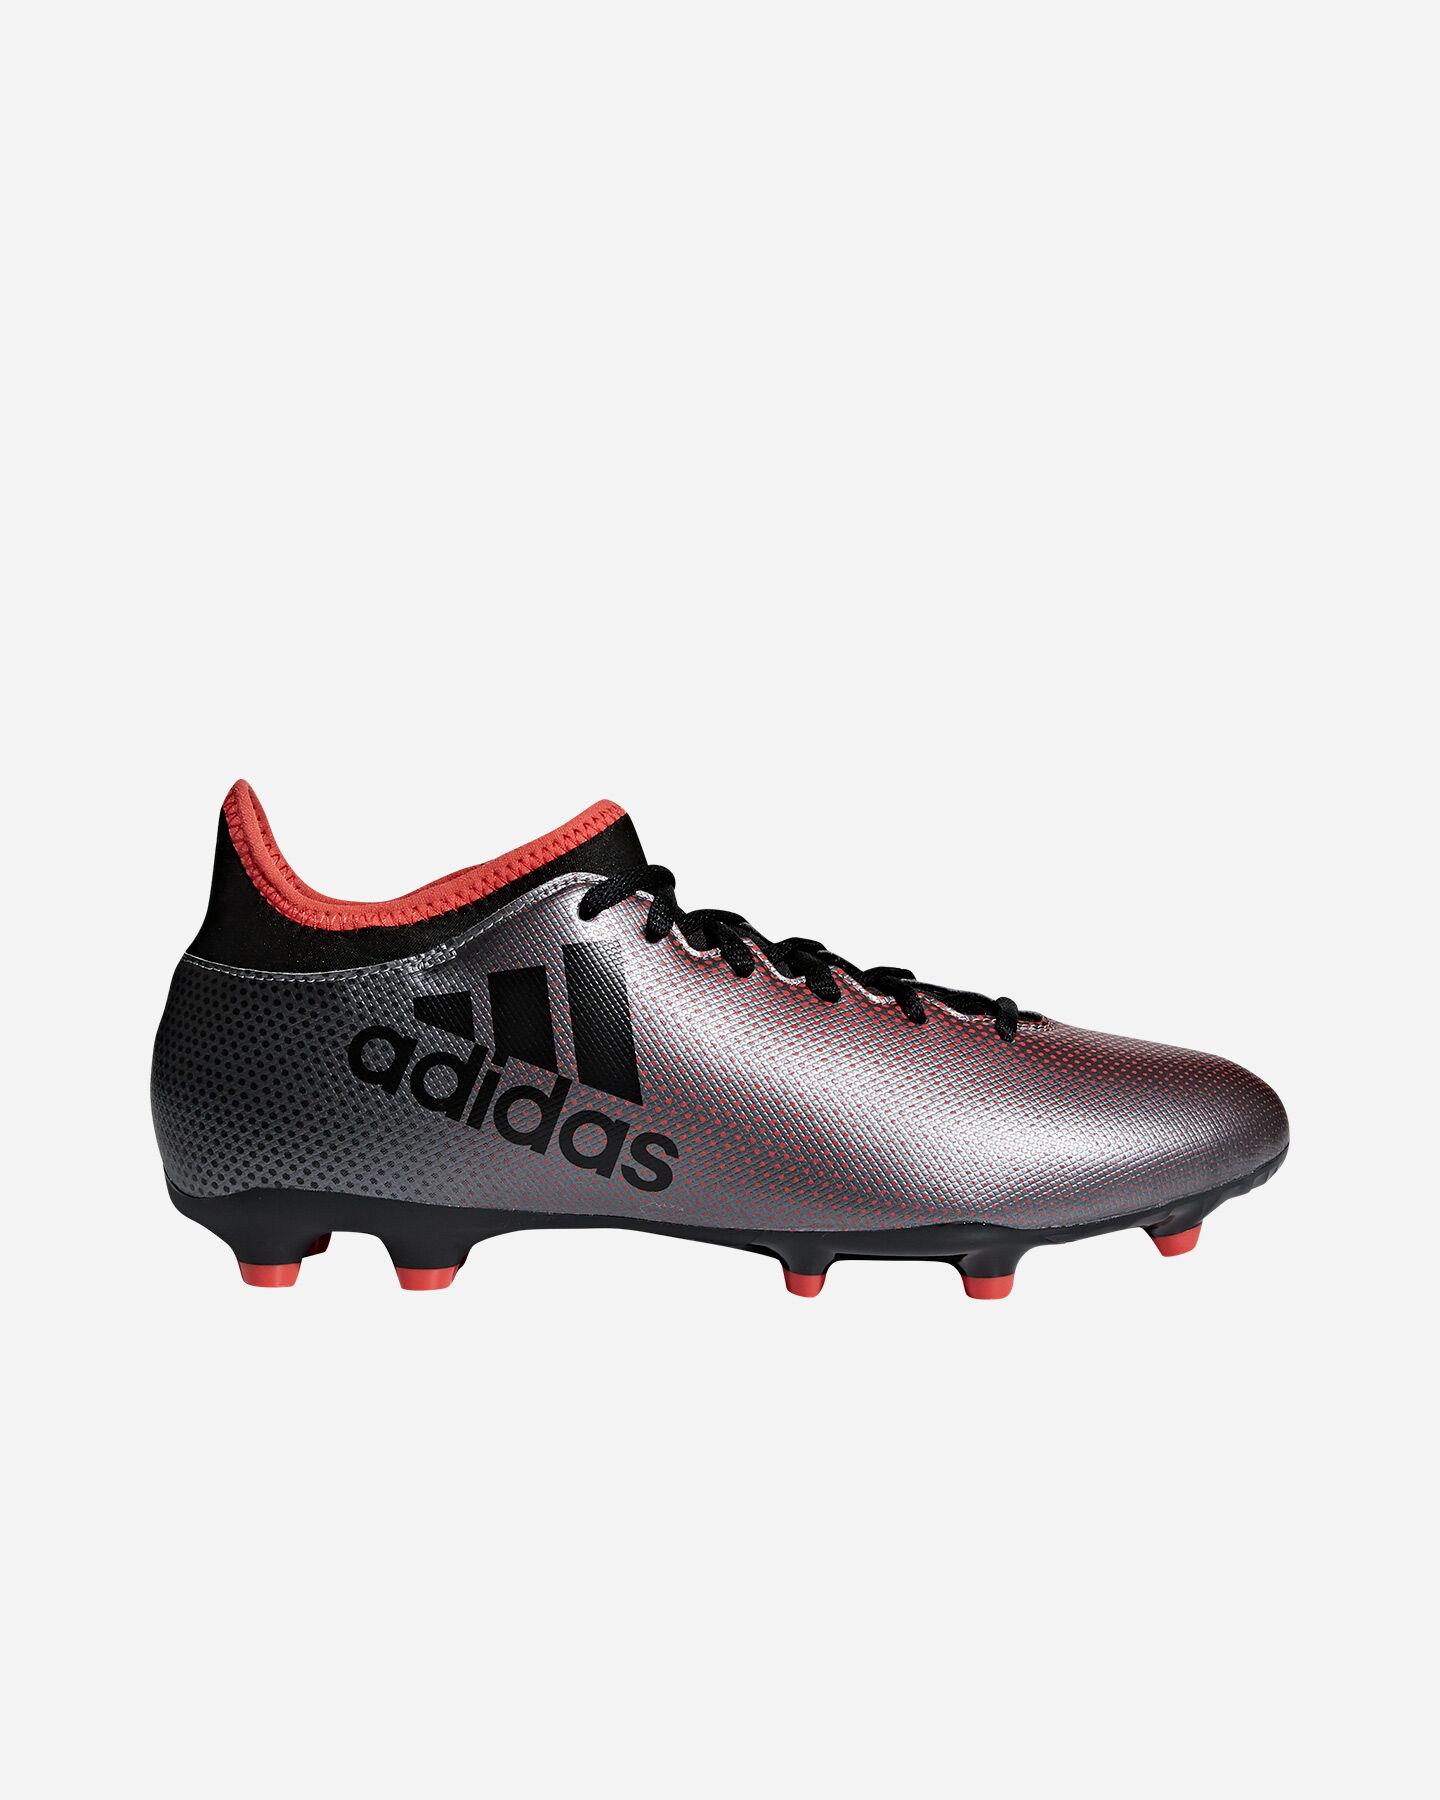 adidas scarpe calcio x 17.3